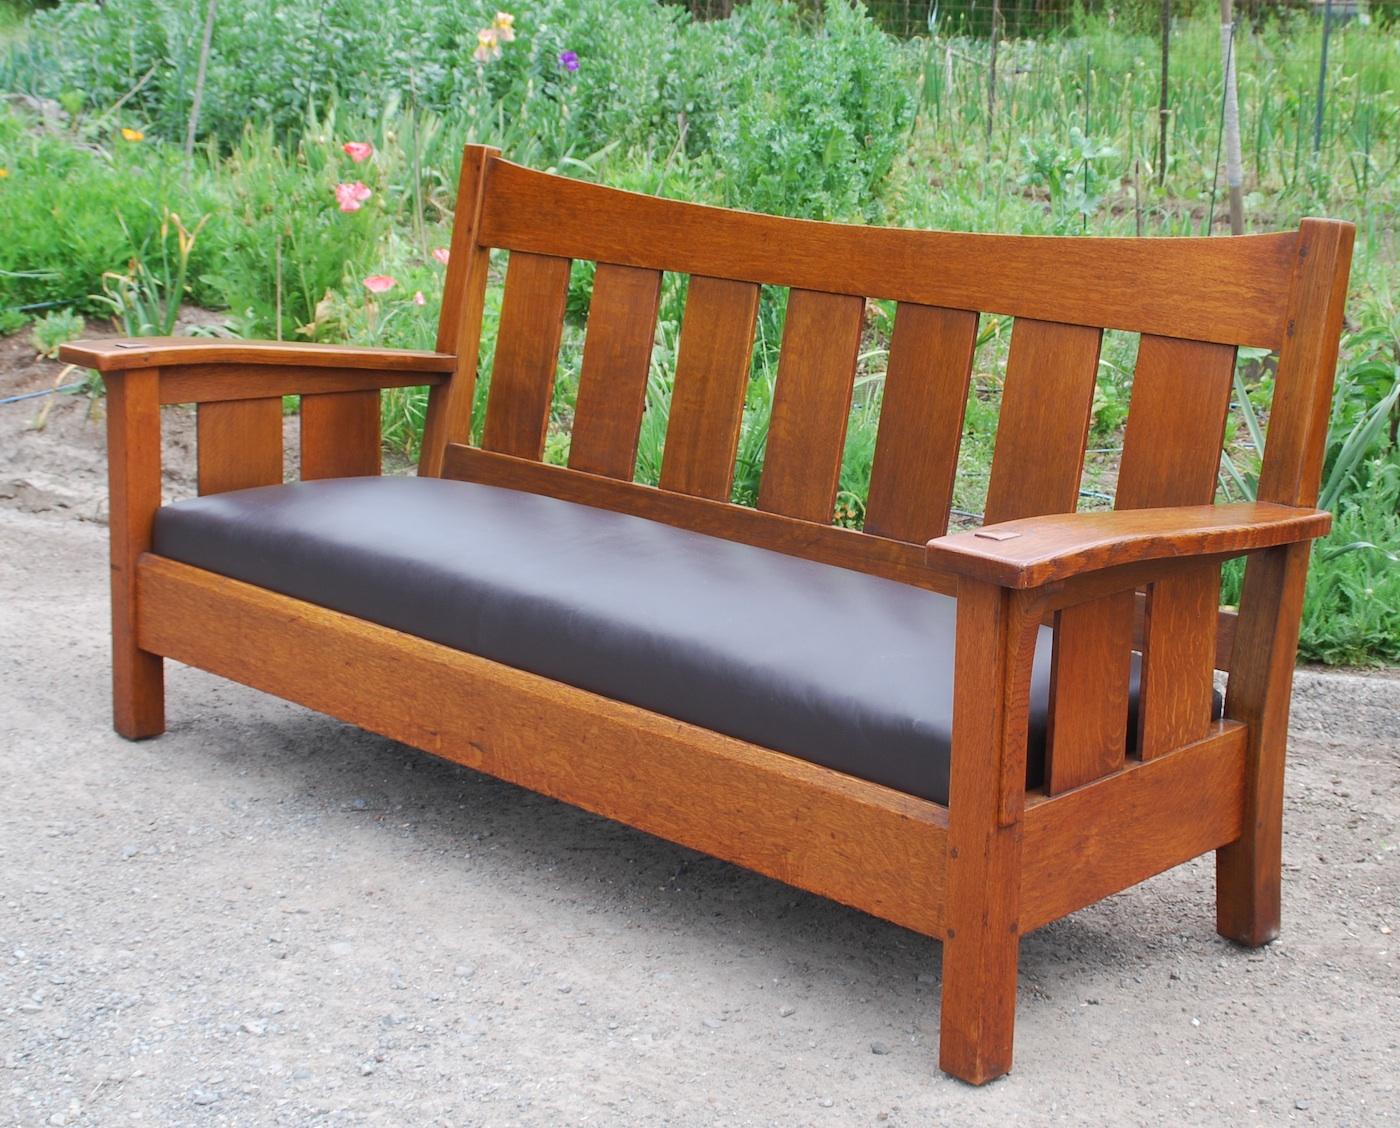 Voorhees Craftsman Mission Oak Furniture Original L J